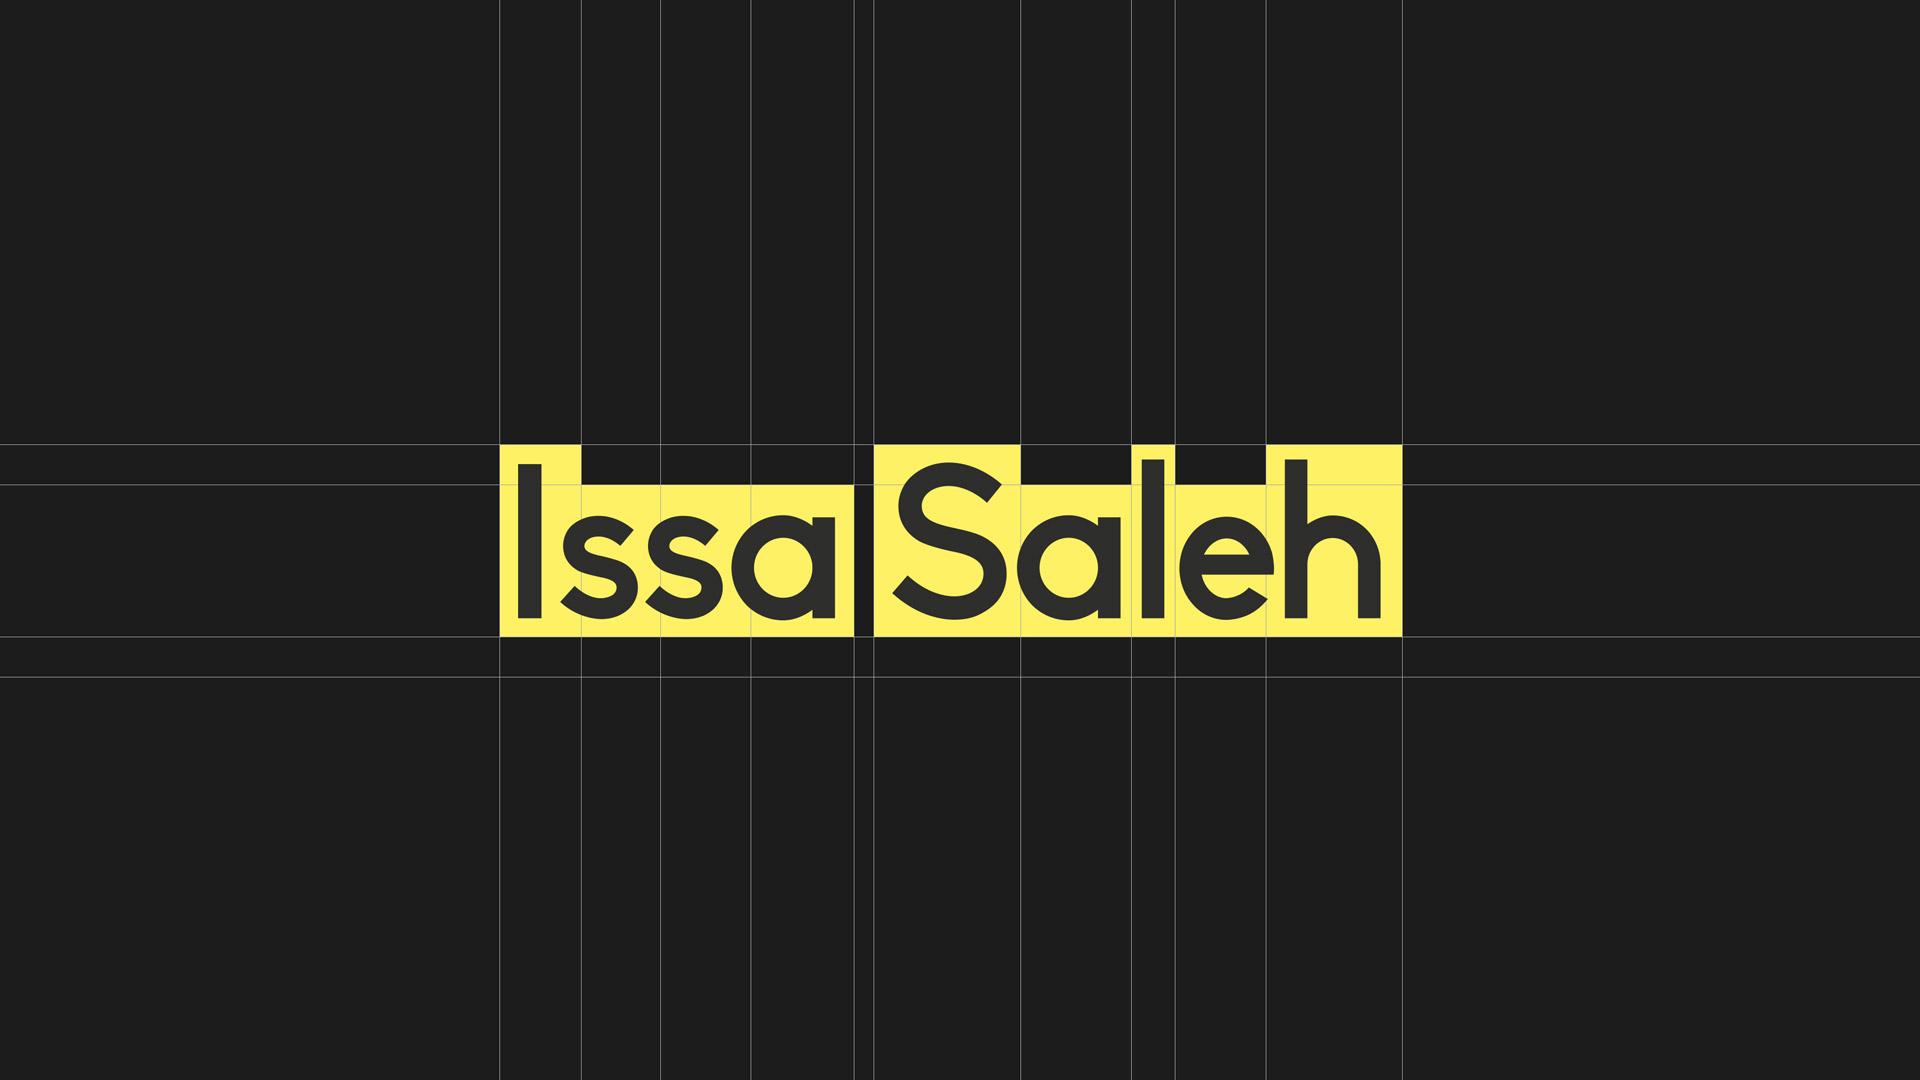 issa_saleh_11